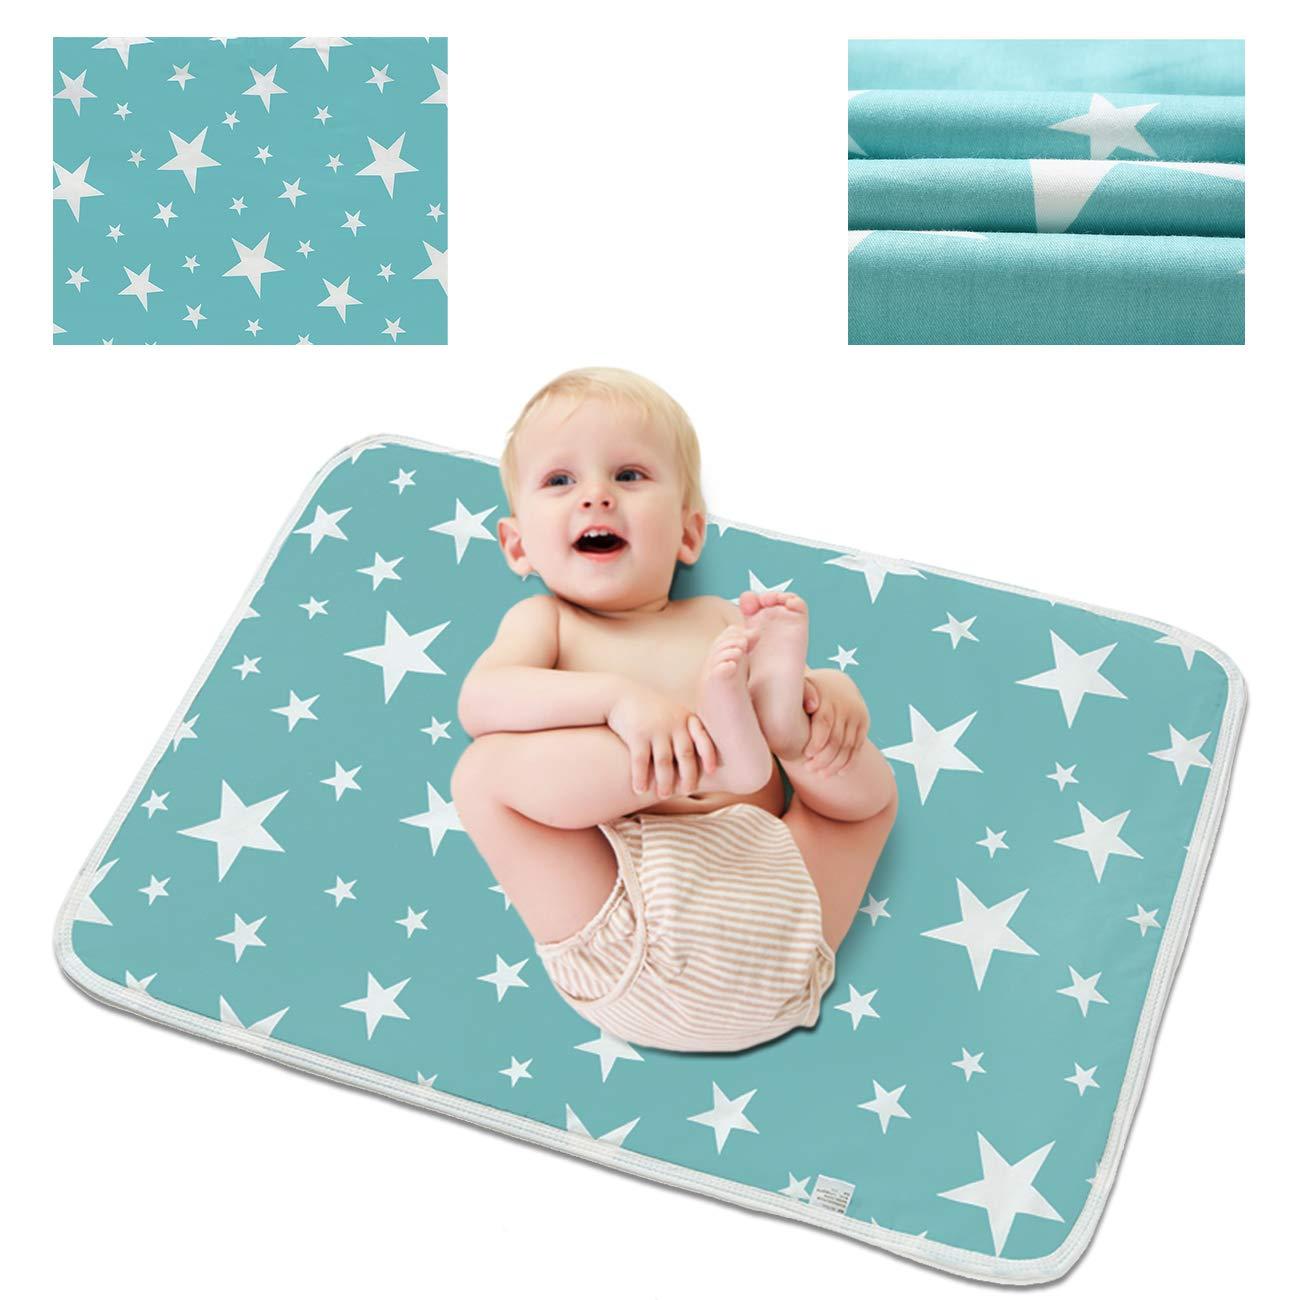 Waterproof Diaper Changing Pad 23.6